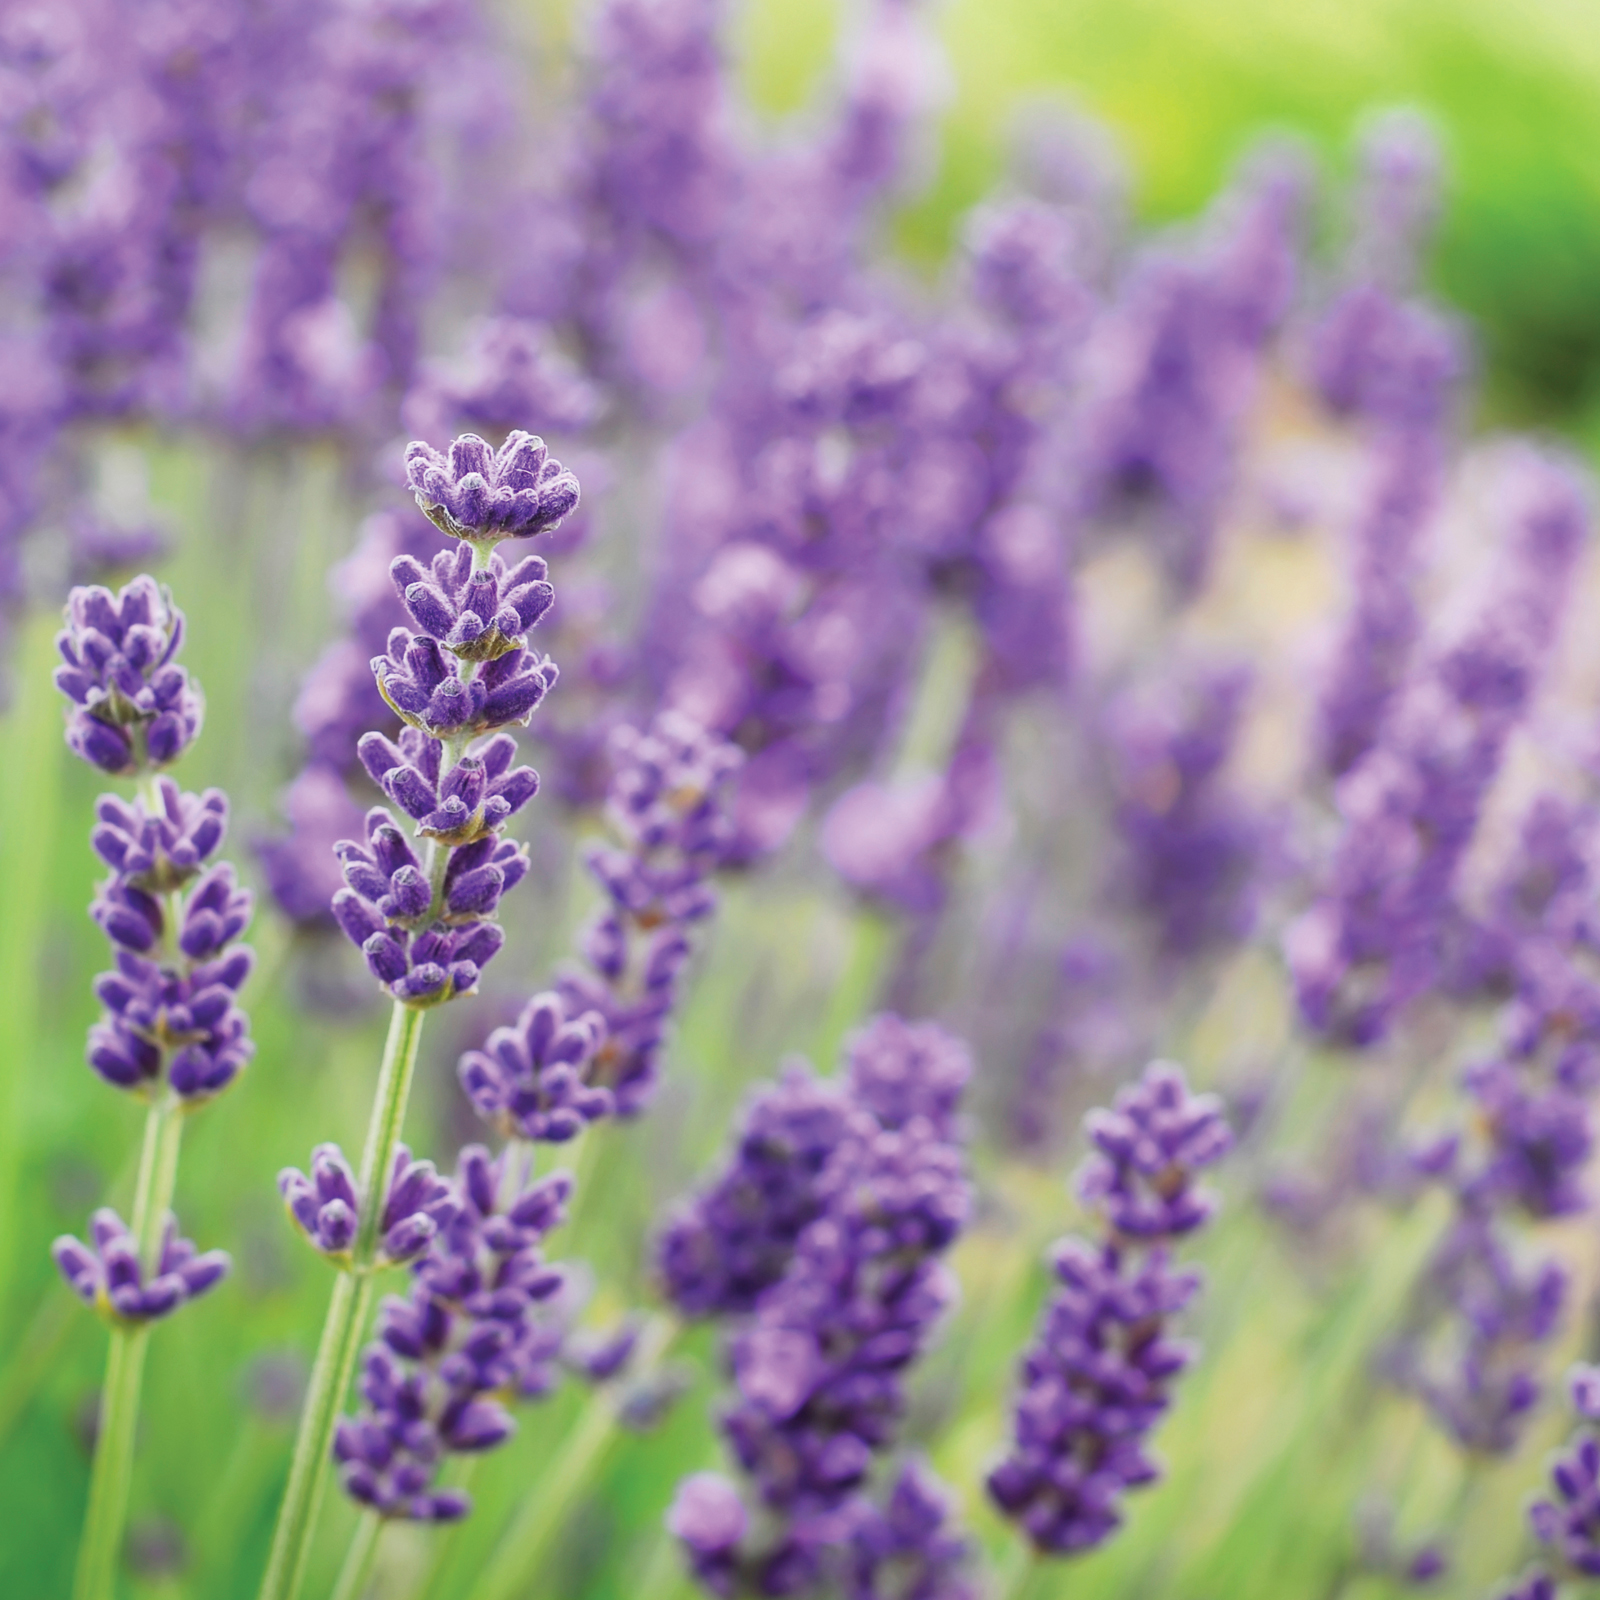 4. Lavender